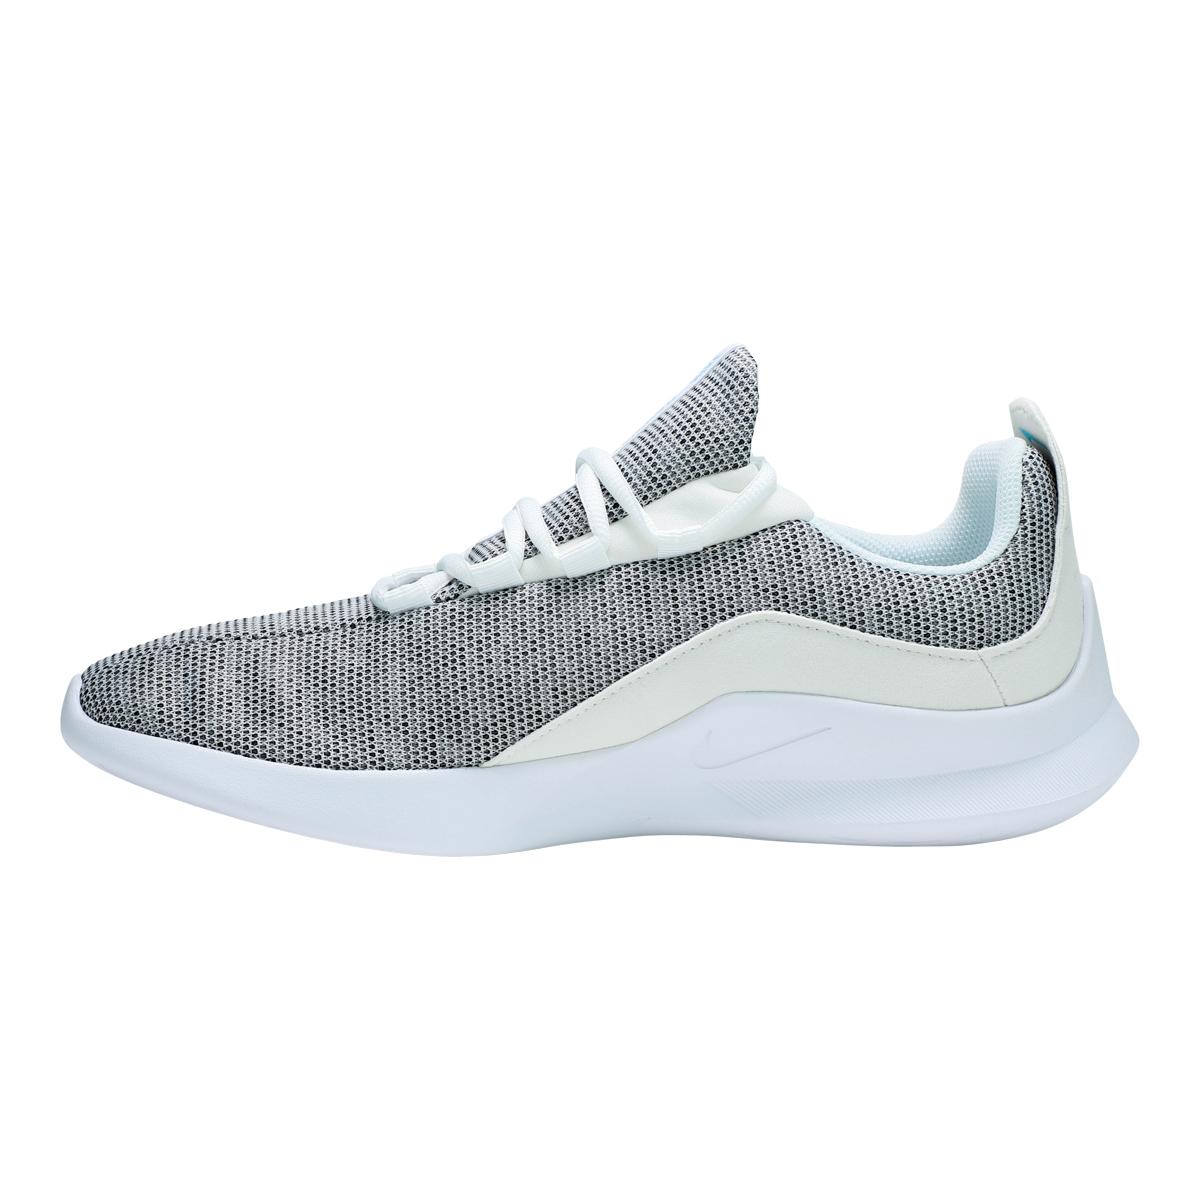 Nike-Men-039-s-Viale-Premium-Running-Shoes thumbnail 18